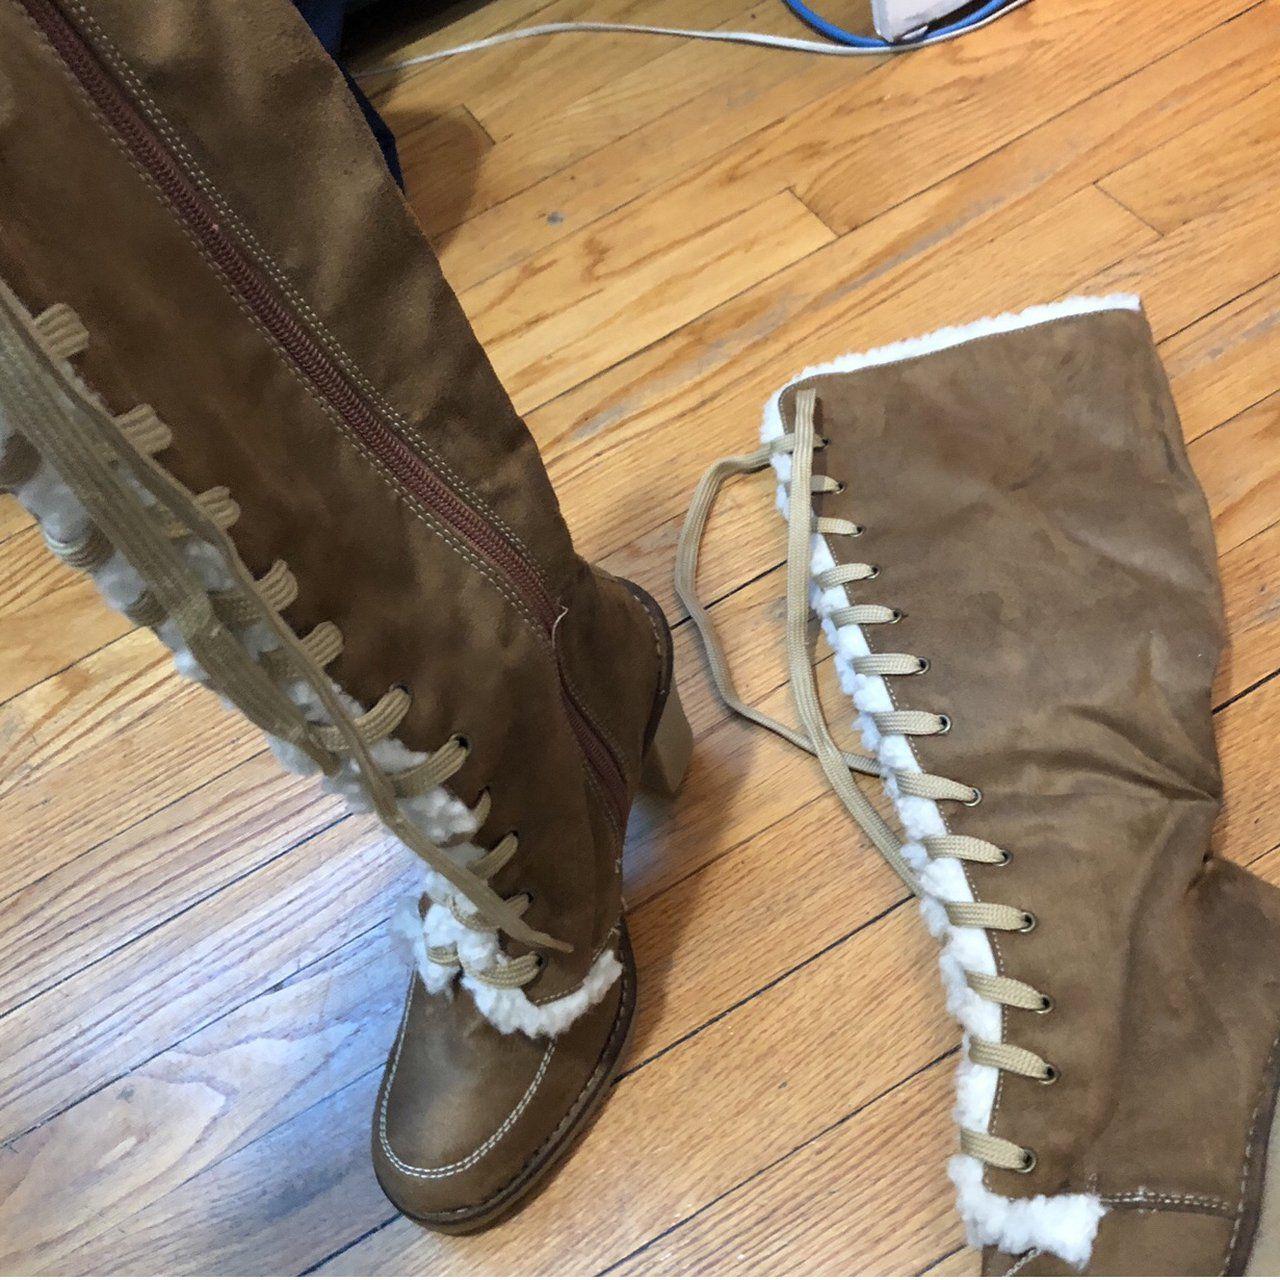 8389c4952c62 Listed on Depop by erika68 | DEPOP needs | Boots, Heeled boots, Depop